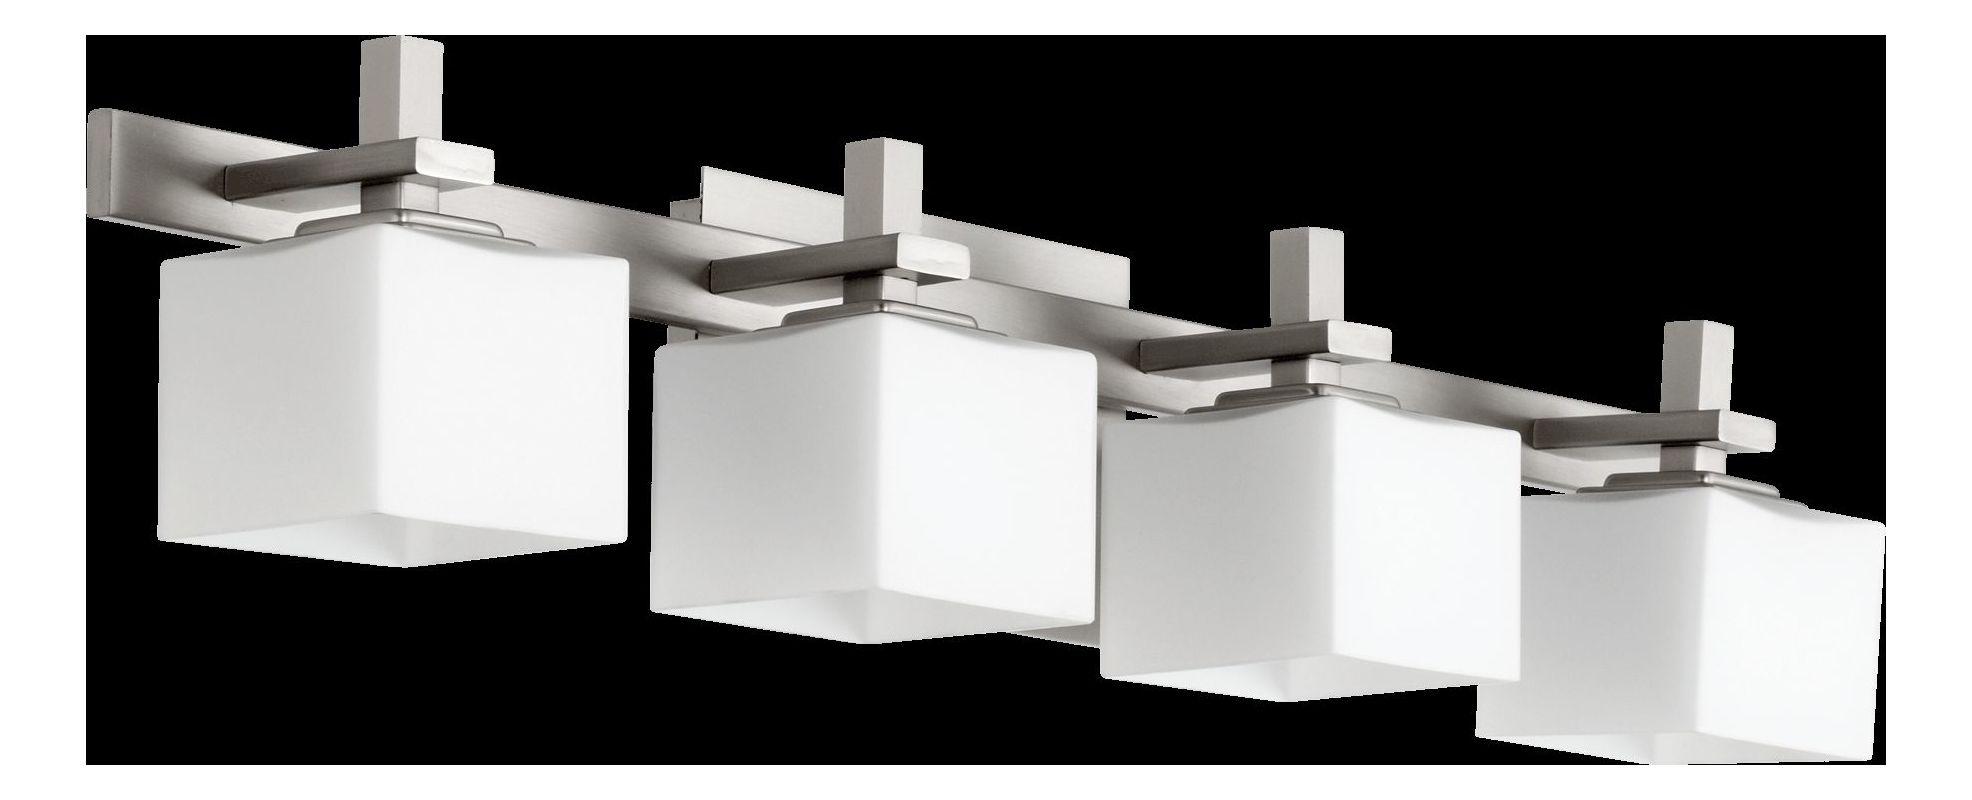 "Shop Portfolio 3 Light Vassar Brushed Nickel Bathroom: Quorum International 5365-4-65 Satin Nickel 5.25"" Height 4"